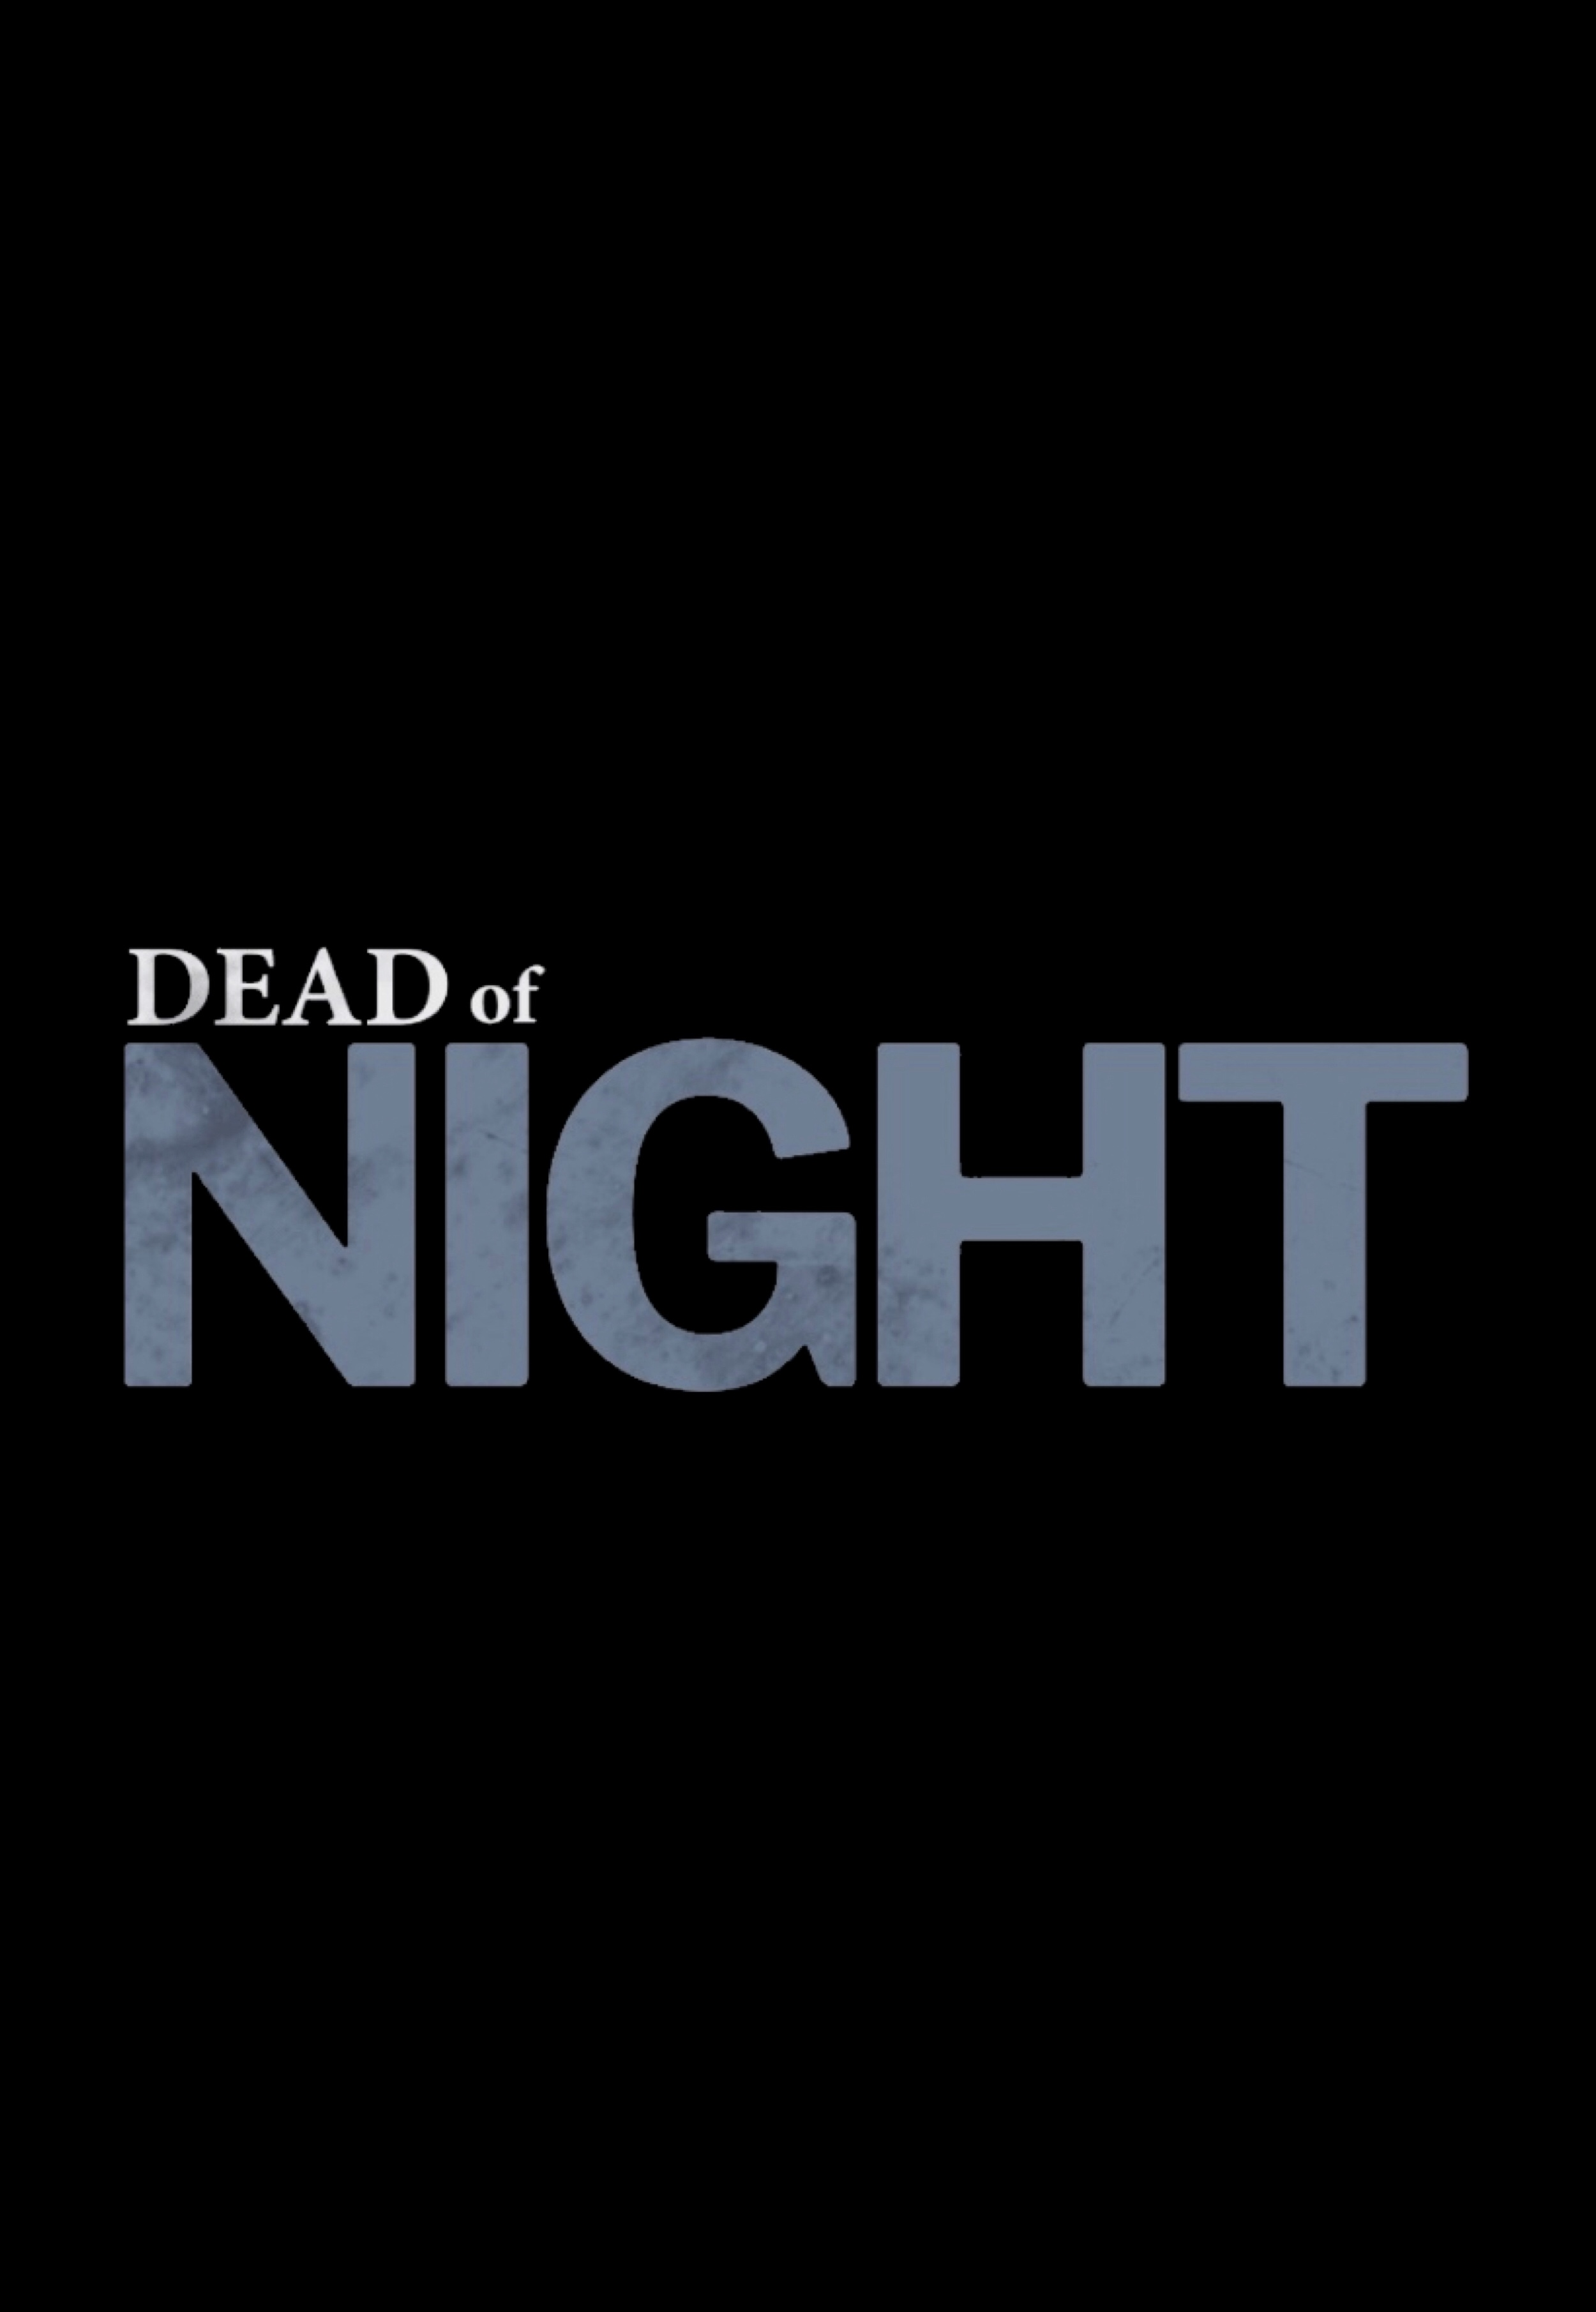 Dead of Night (TV Series 2018– ) - IMDb